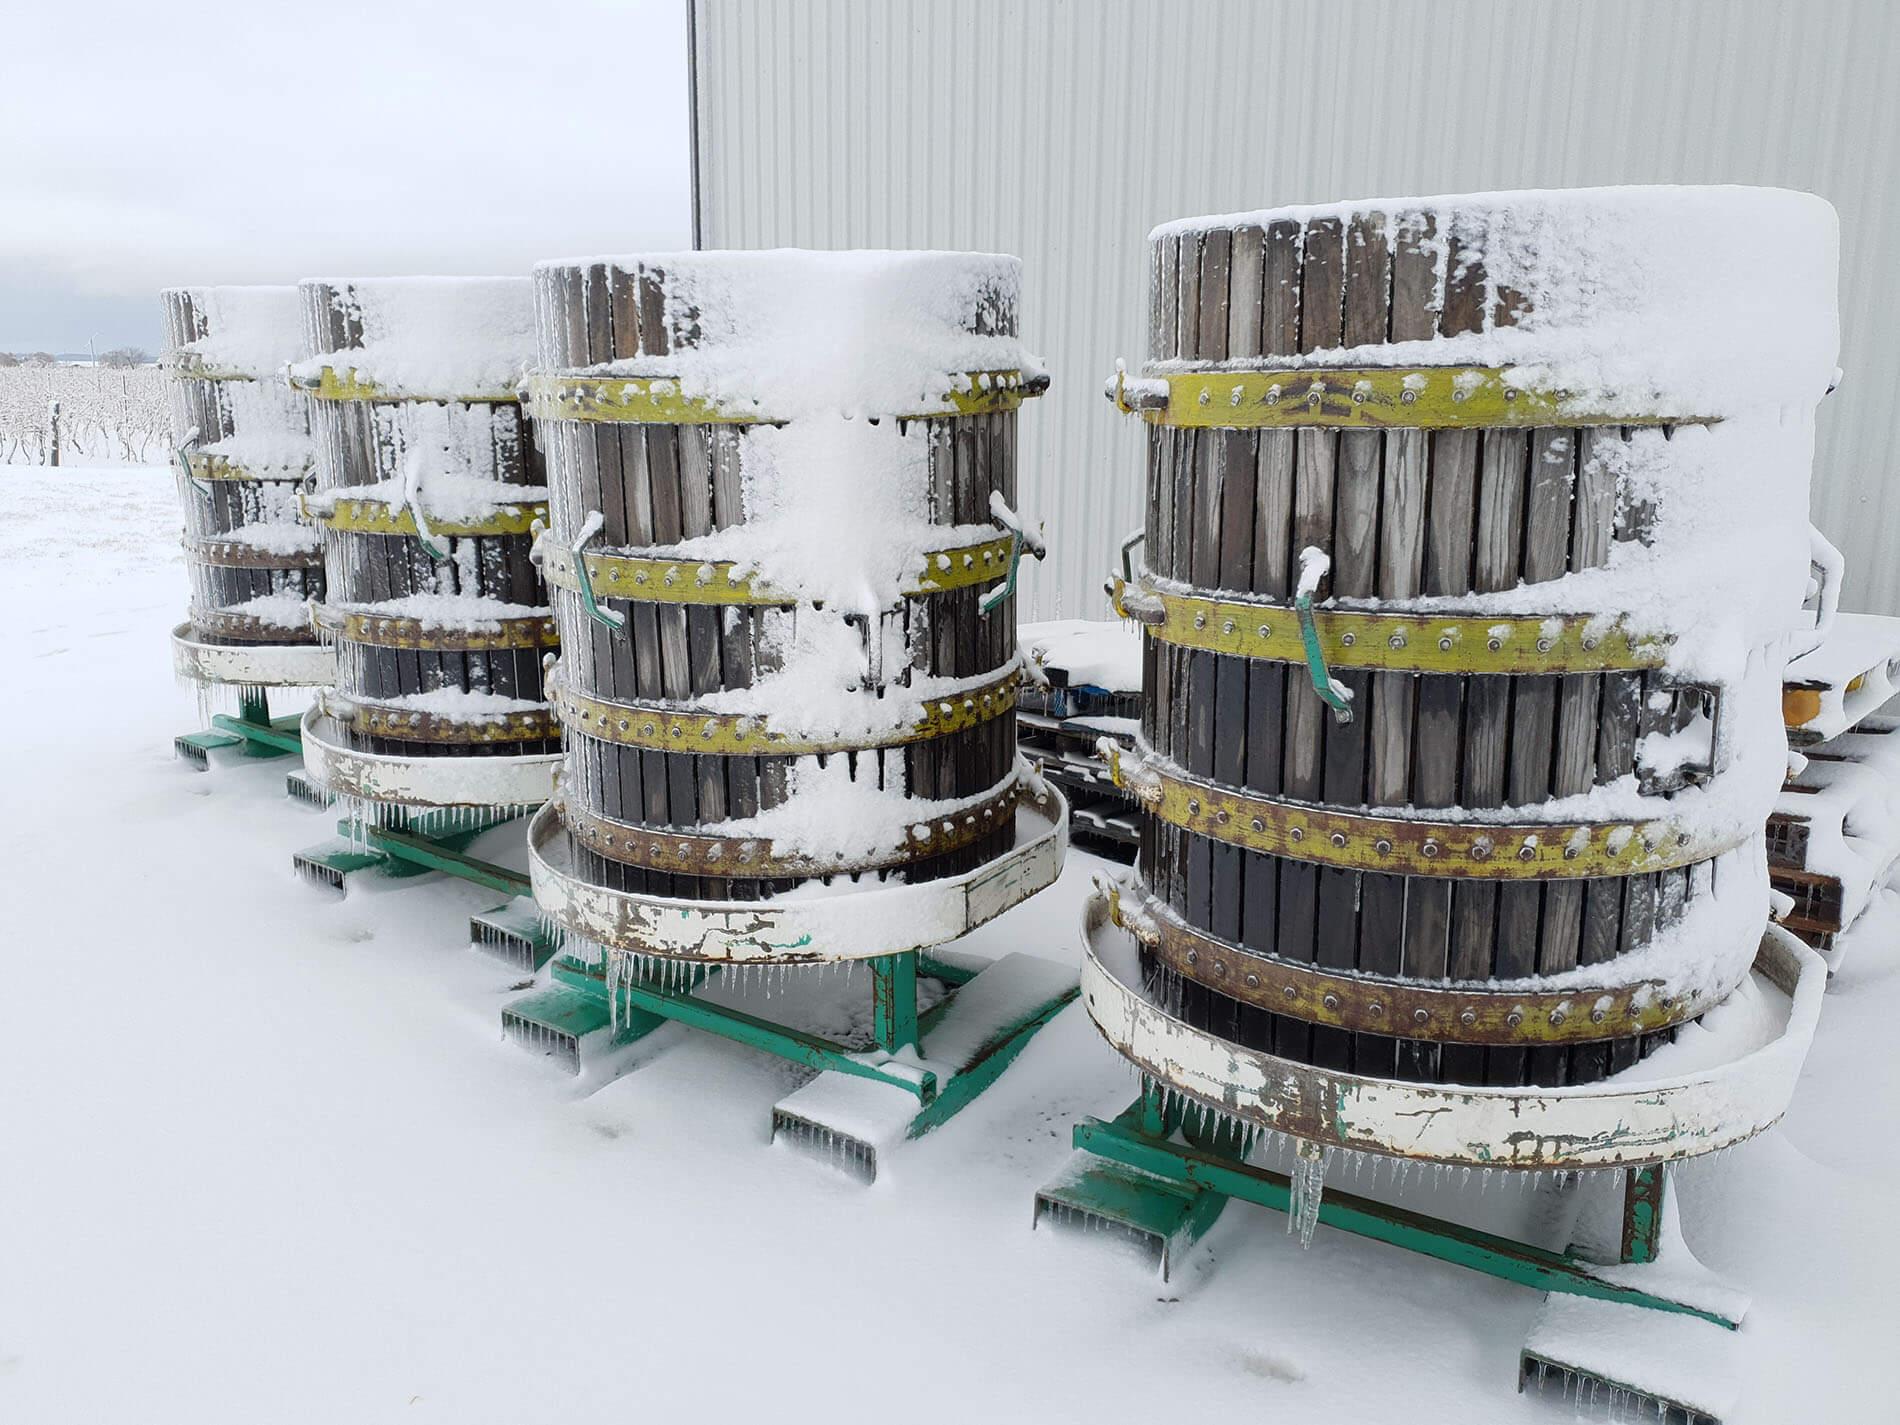 Ľadové víno - sudy